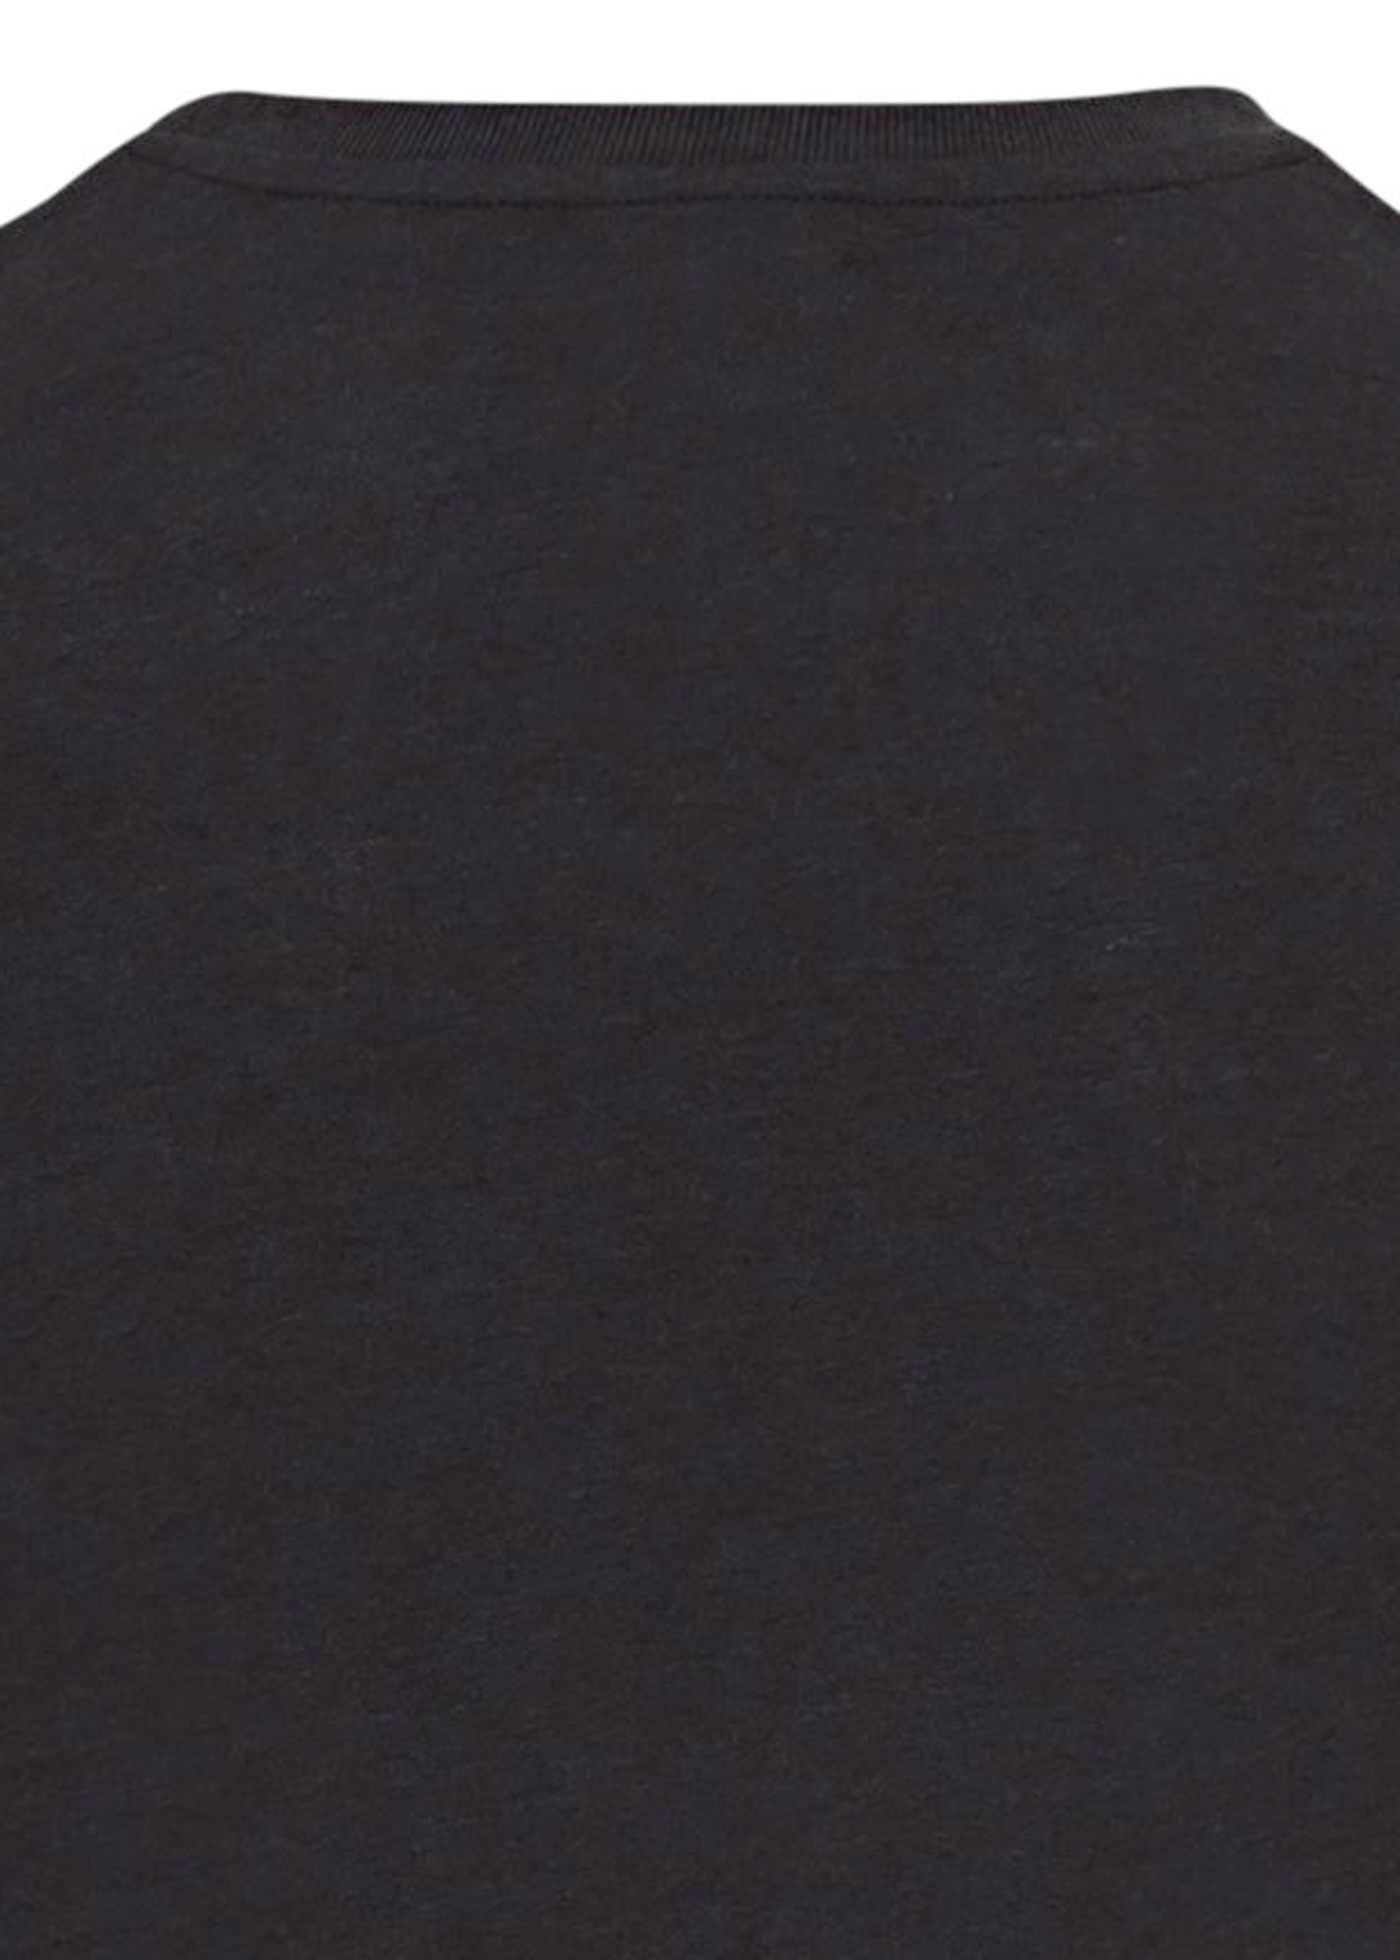 CREW T-Shirt image number 3